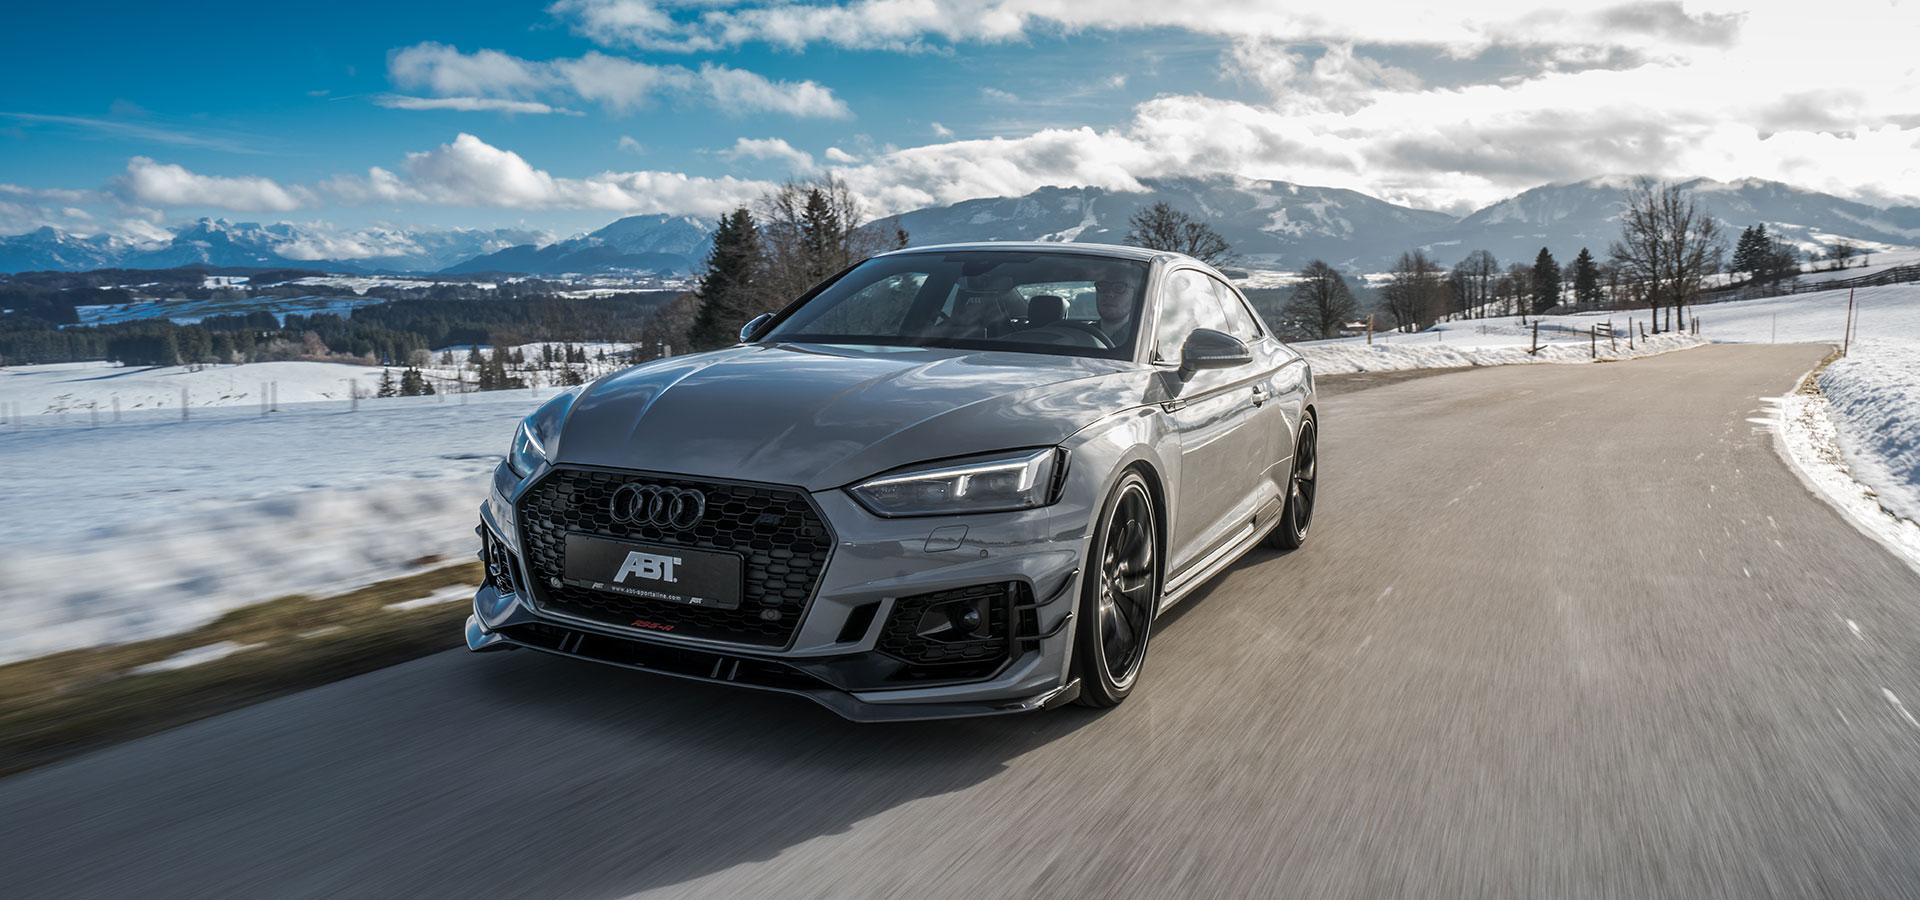 Audi Rs5 Sportback 4k 2019 Wallpapers: ABT Sportsline